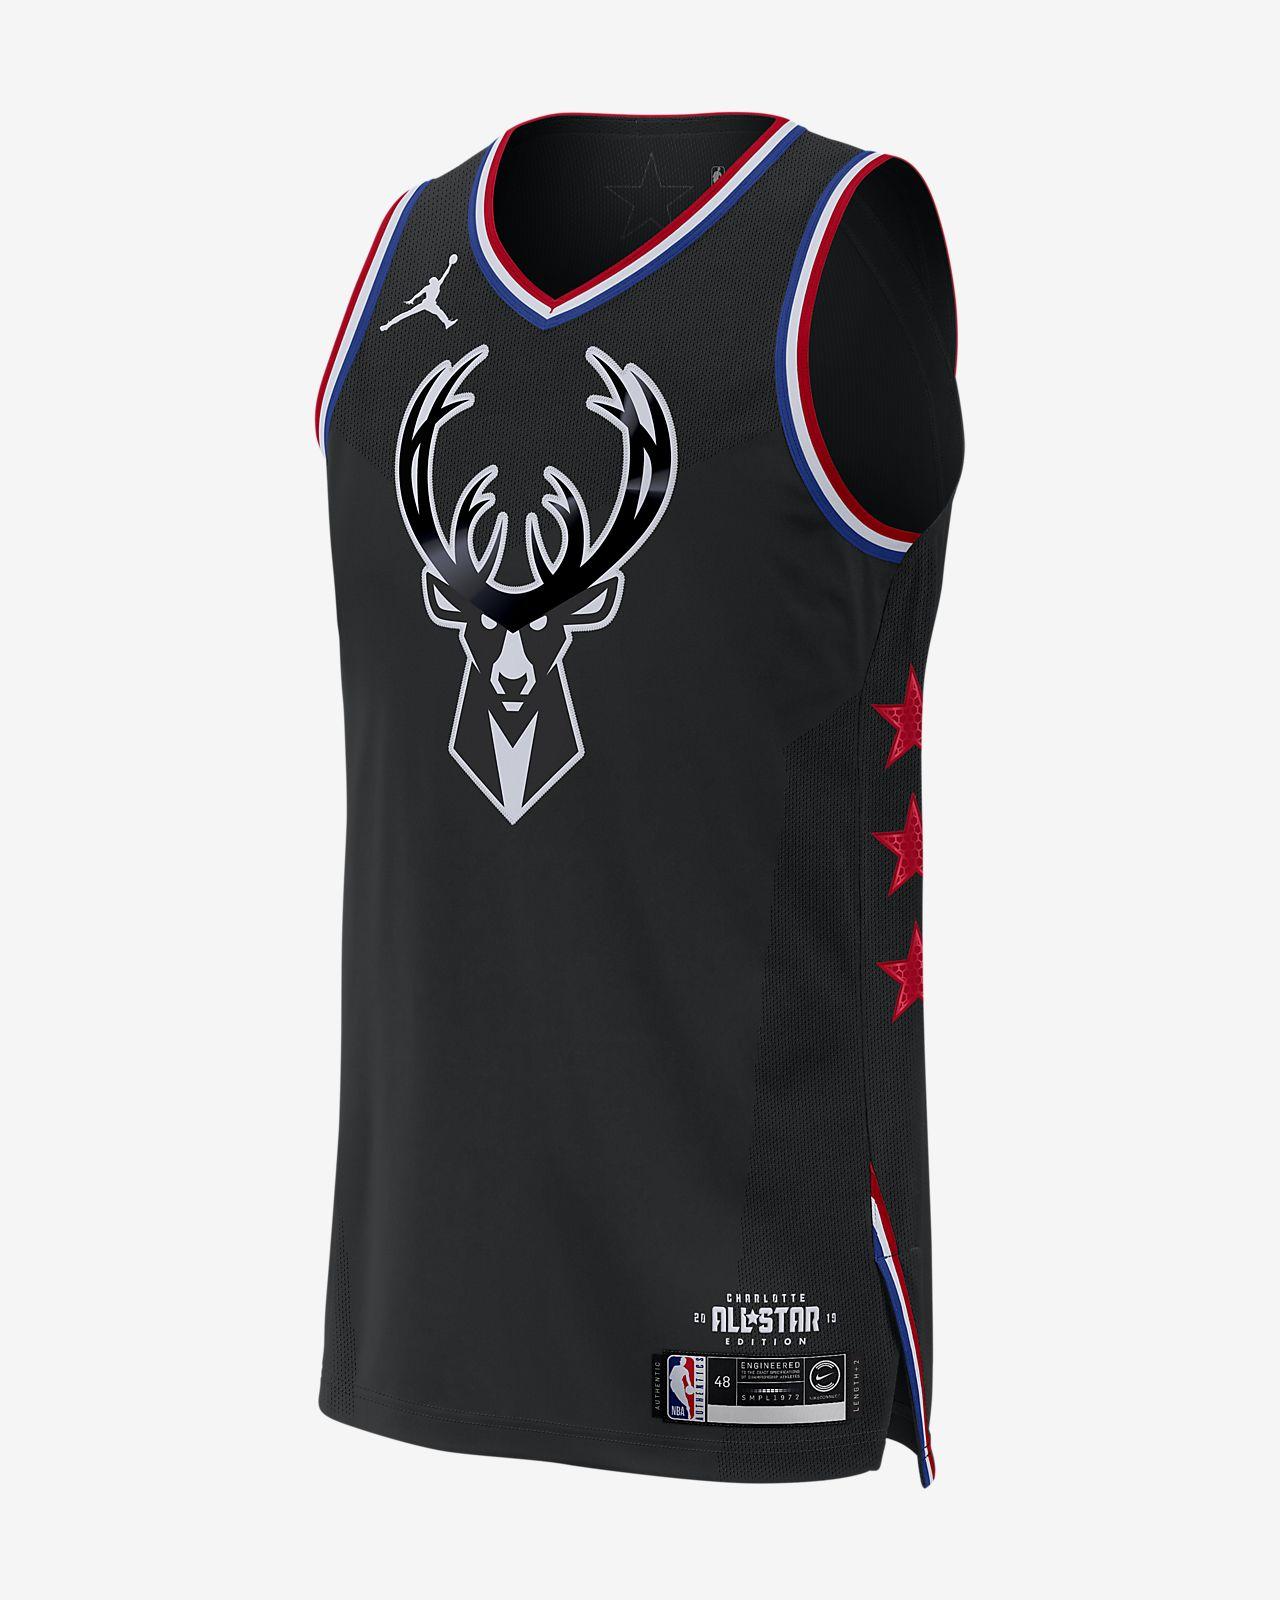 c96163ac050 Men's Jordan NBA Connected Jersey. Giannis Antetokounmpo All-Star Edition  Authentic